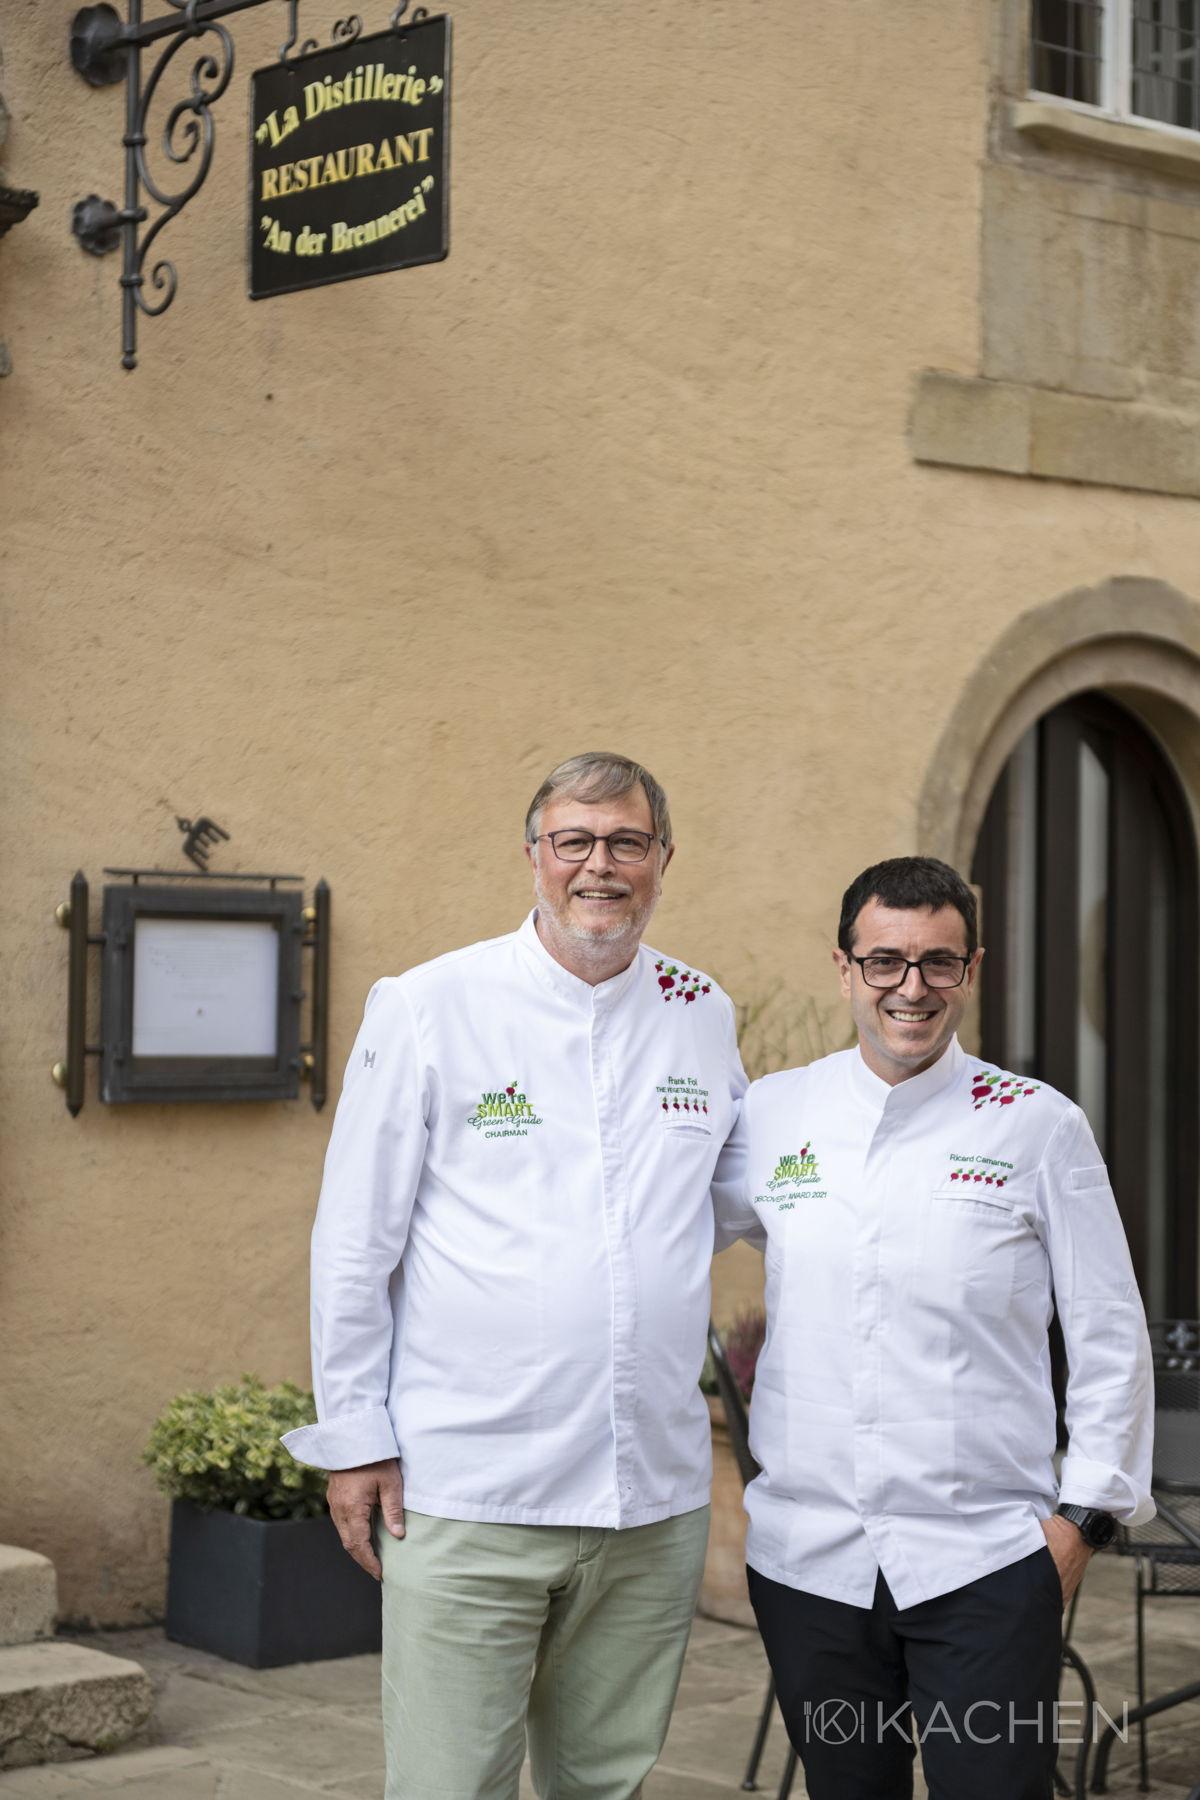 Frank Fol and Chef Ricard Camarena (Ricard Camarena) - winner We